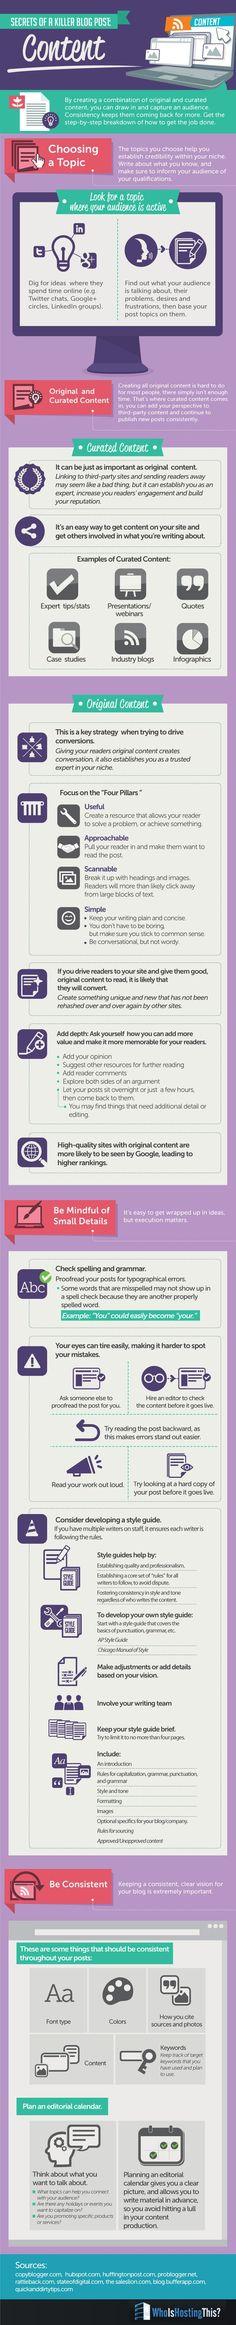 Secrets Of A Killer Blog Content - #BloggingTips @mijo nick Information World  ツ